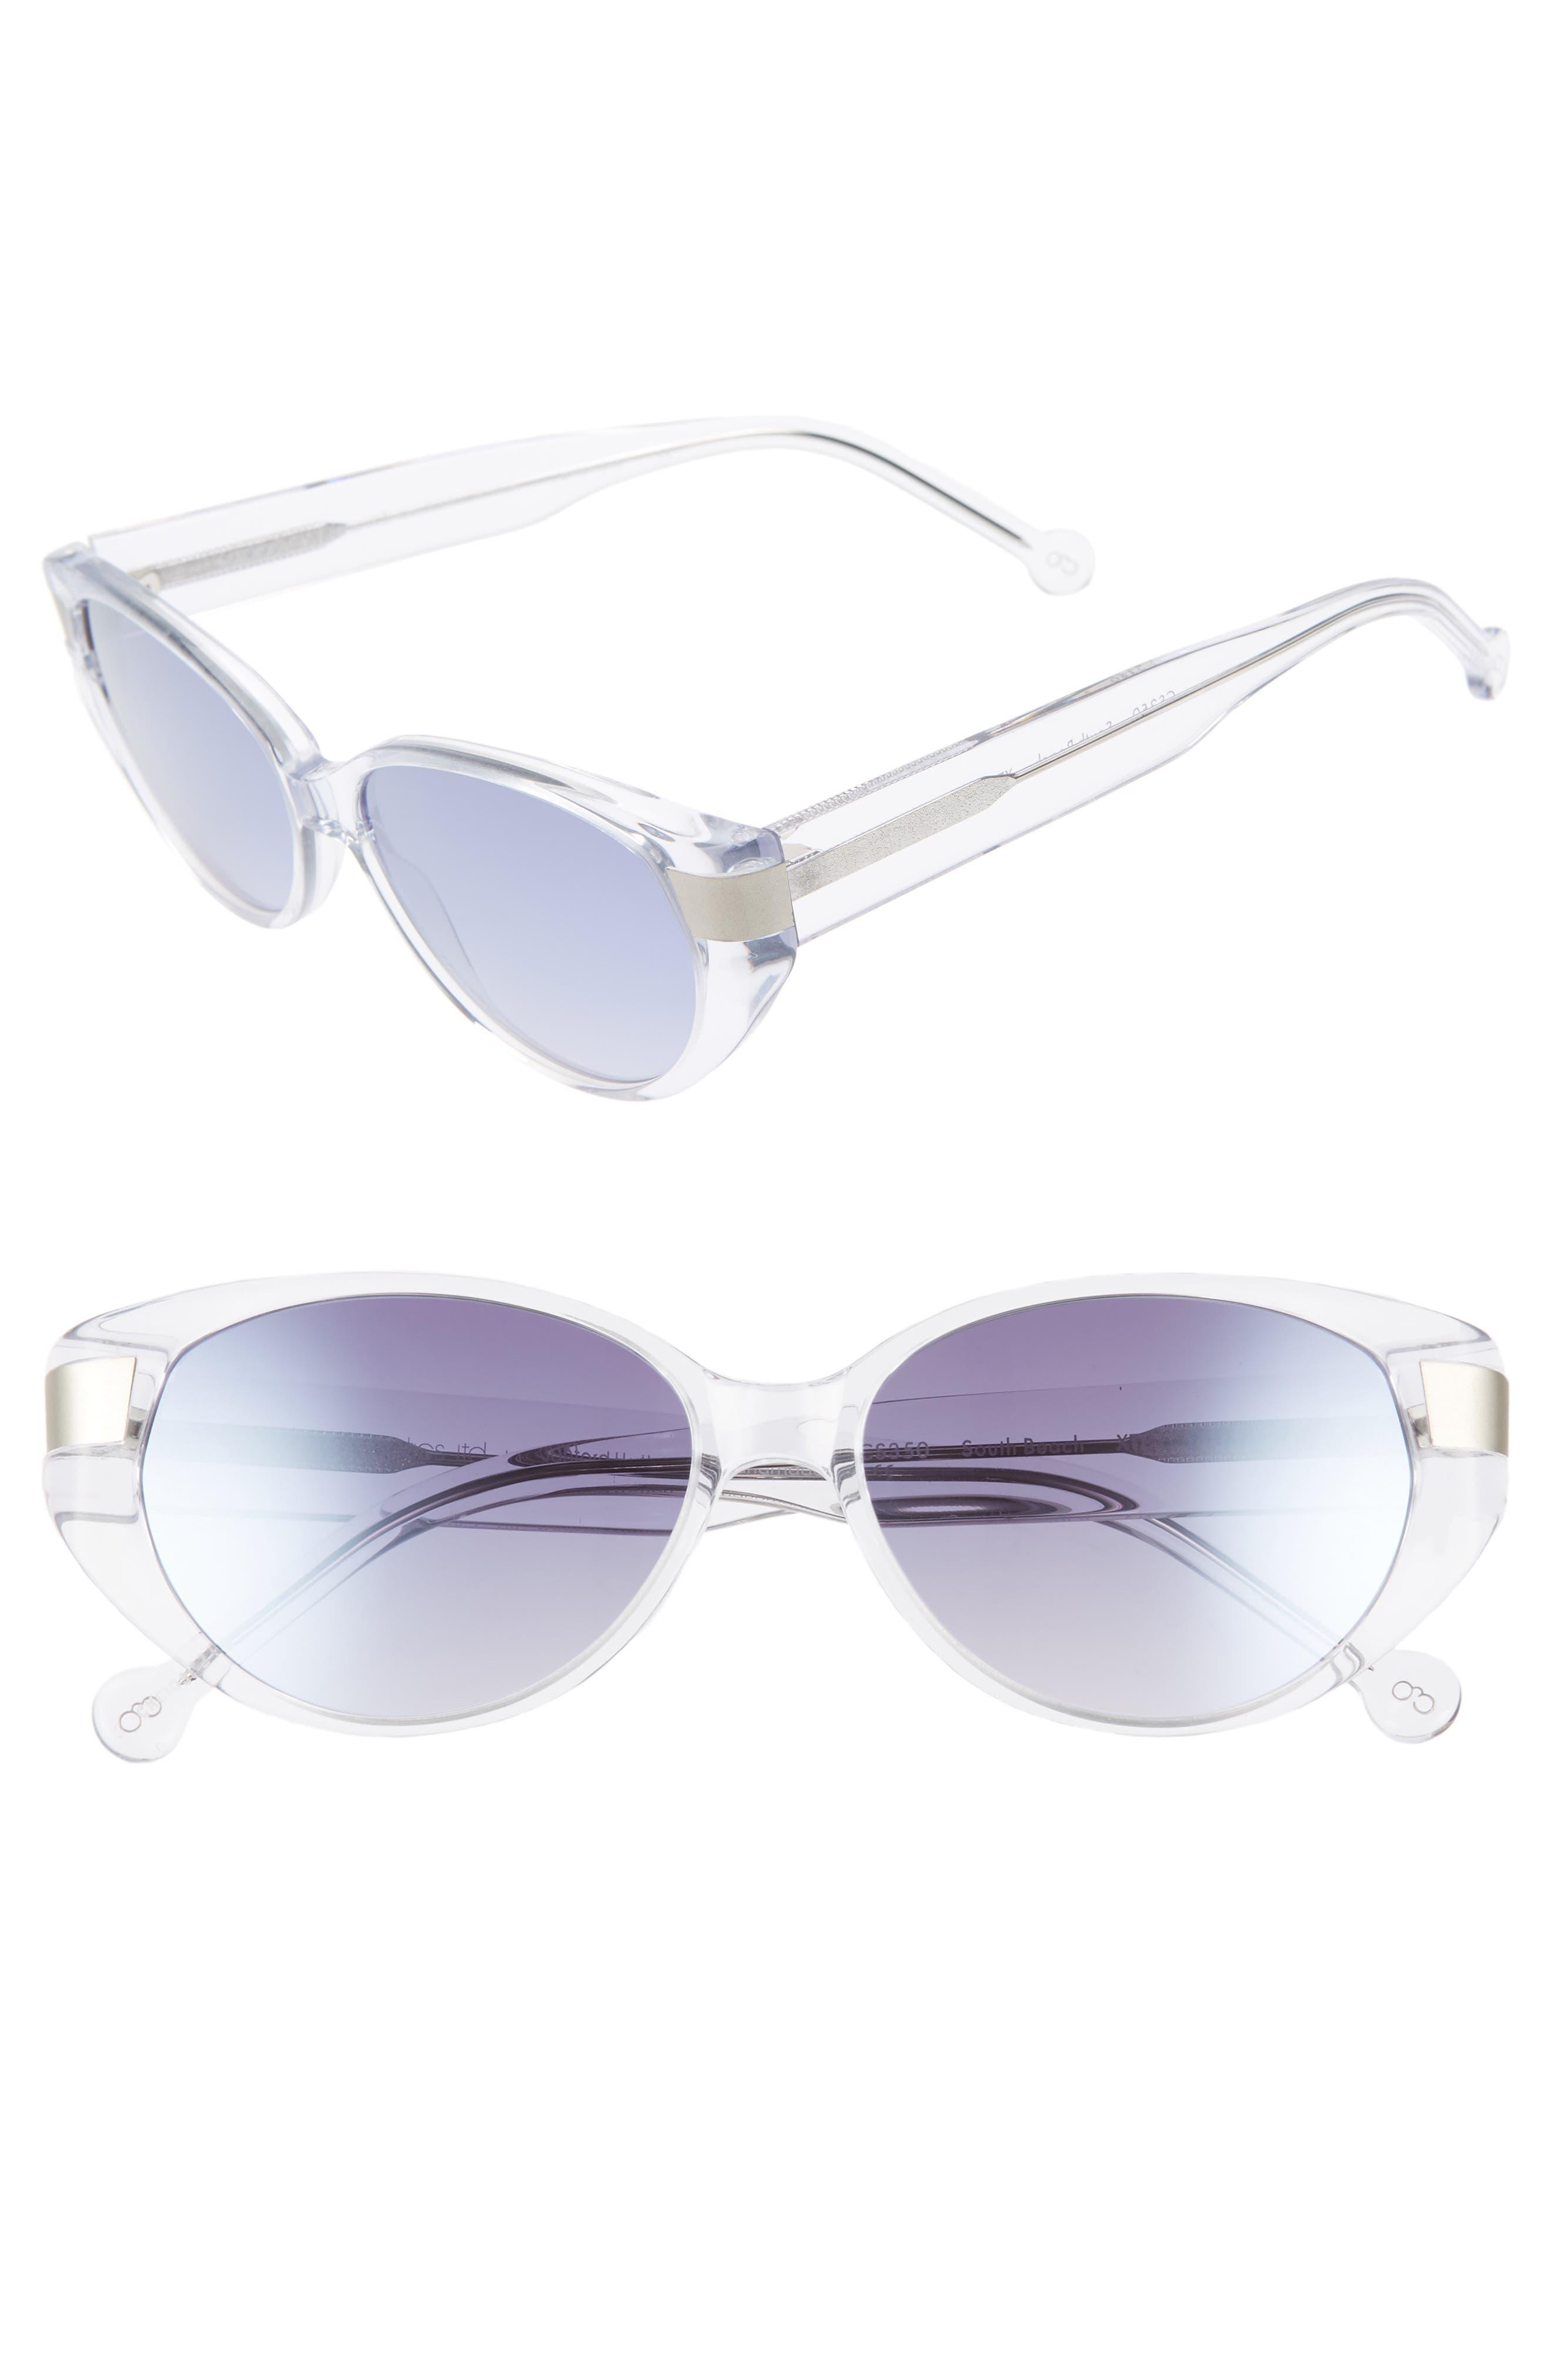 Southbeach 54mm Gradient Cat Eye Sunglasses,                             Main thumbnail 1, color,                             CRYSTAL